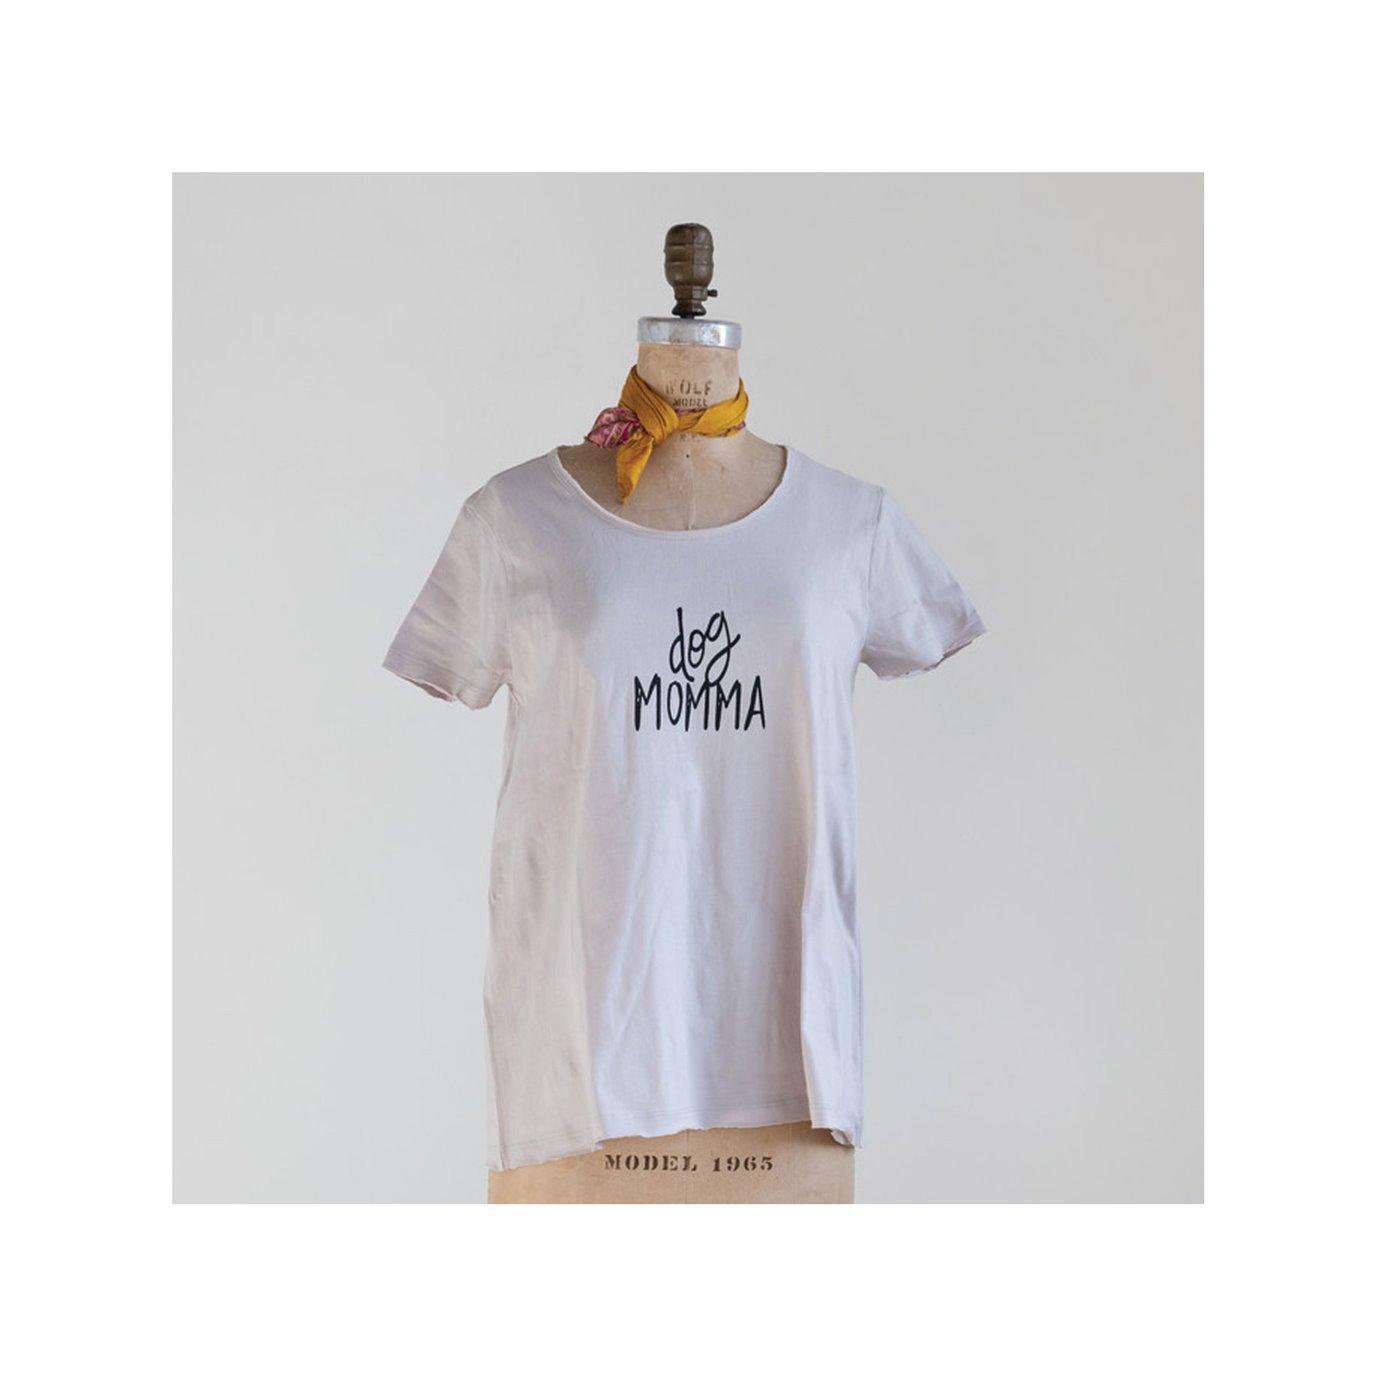 "Cotton Screen Printed T-Shirt ""Dog Momma"", Grey & Black, Small"